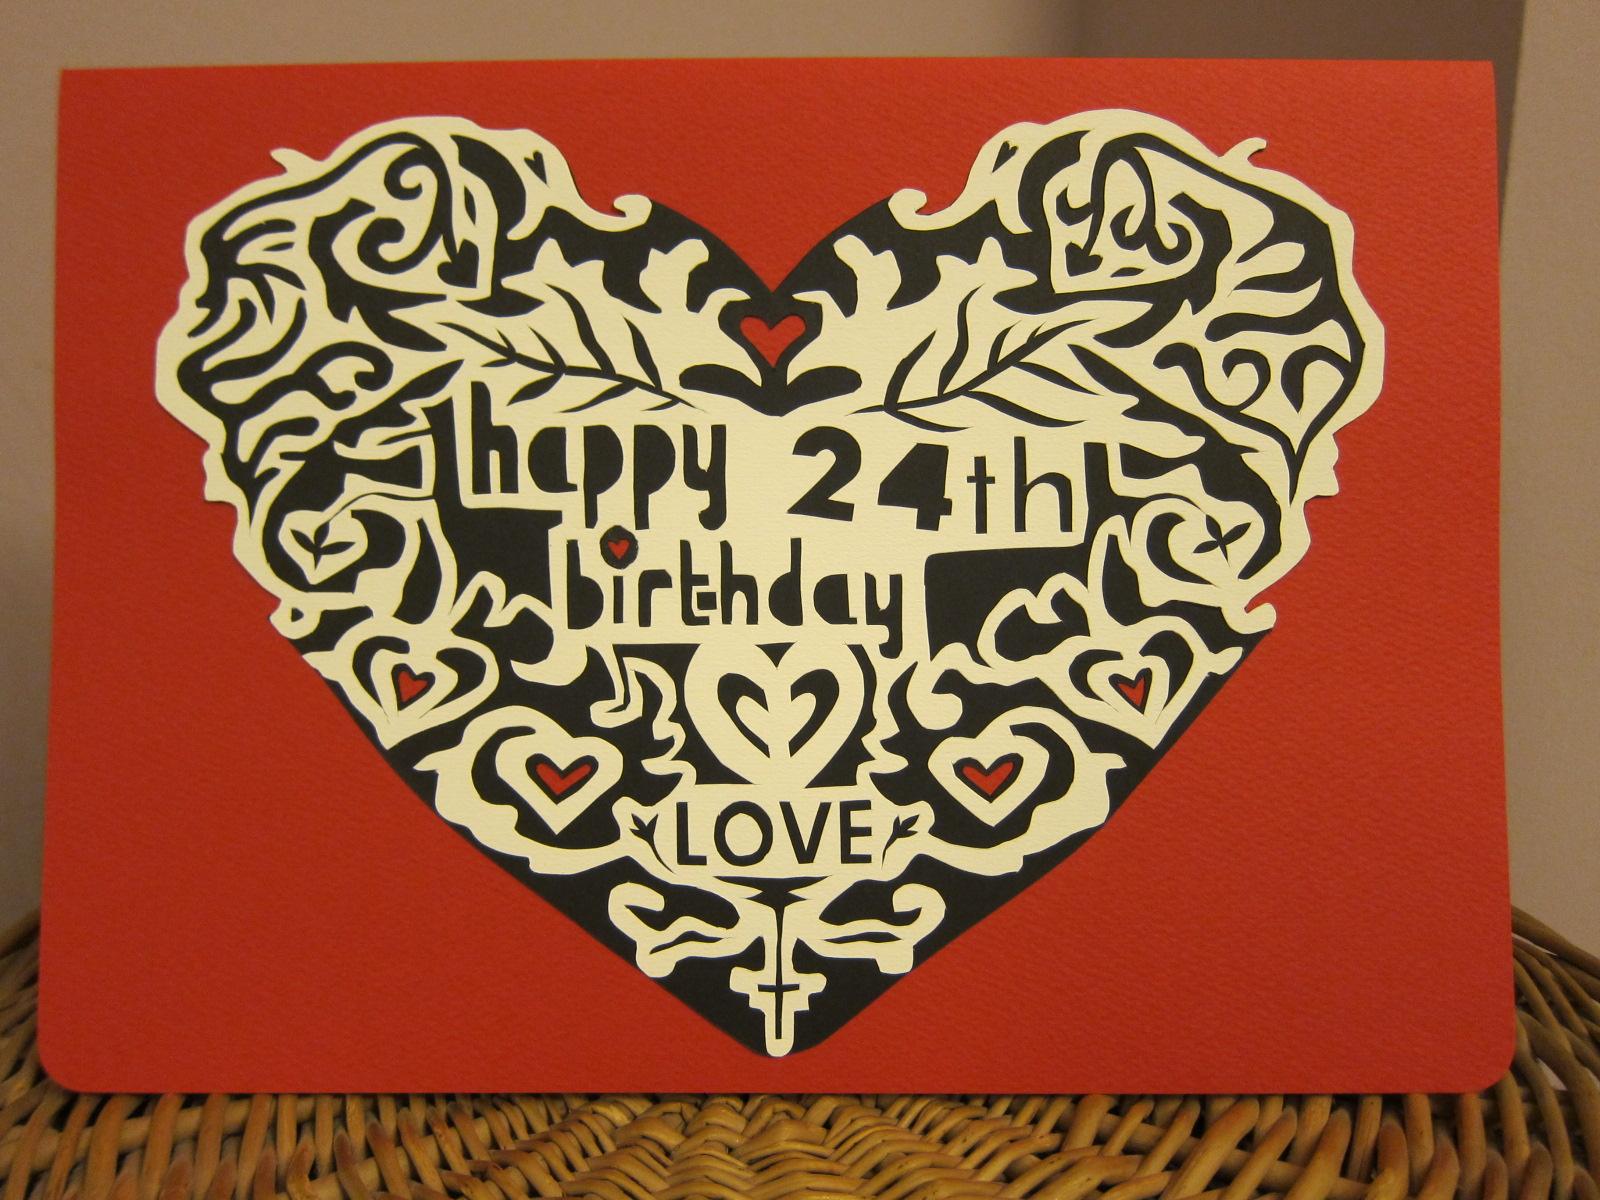 tamar20 images happy 24th birthday tamara hd wallpaper and